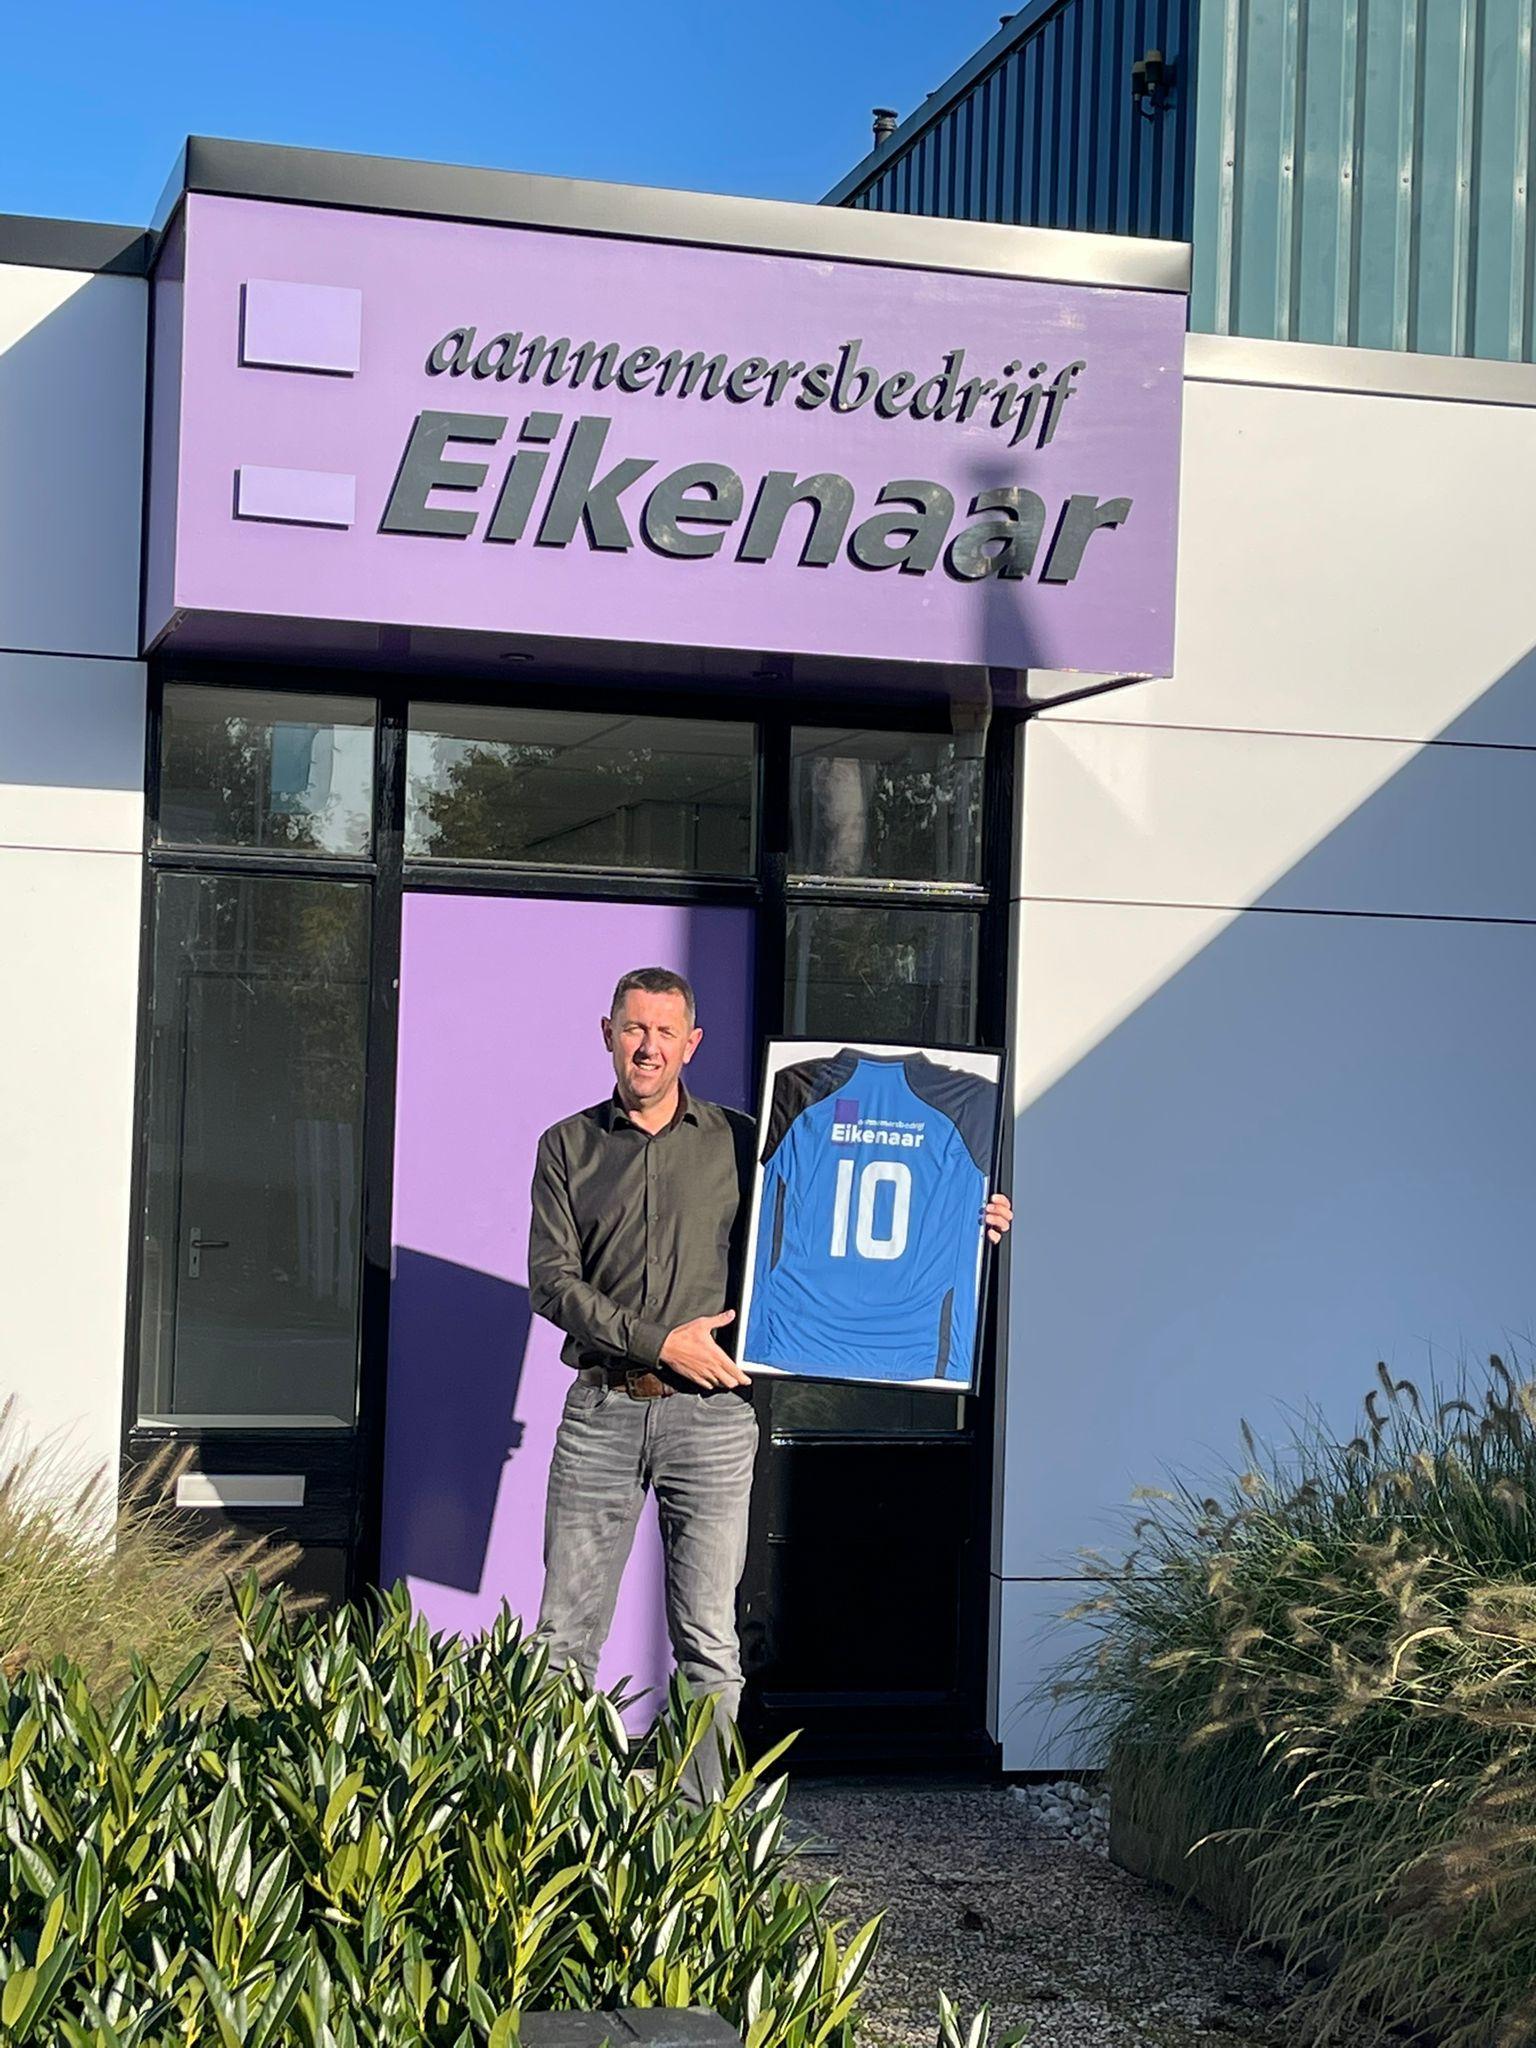 Sponsor: Bouwbedrijf Rudi Eikenaar